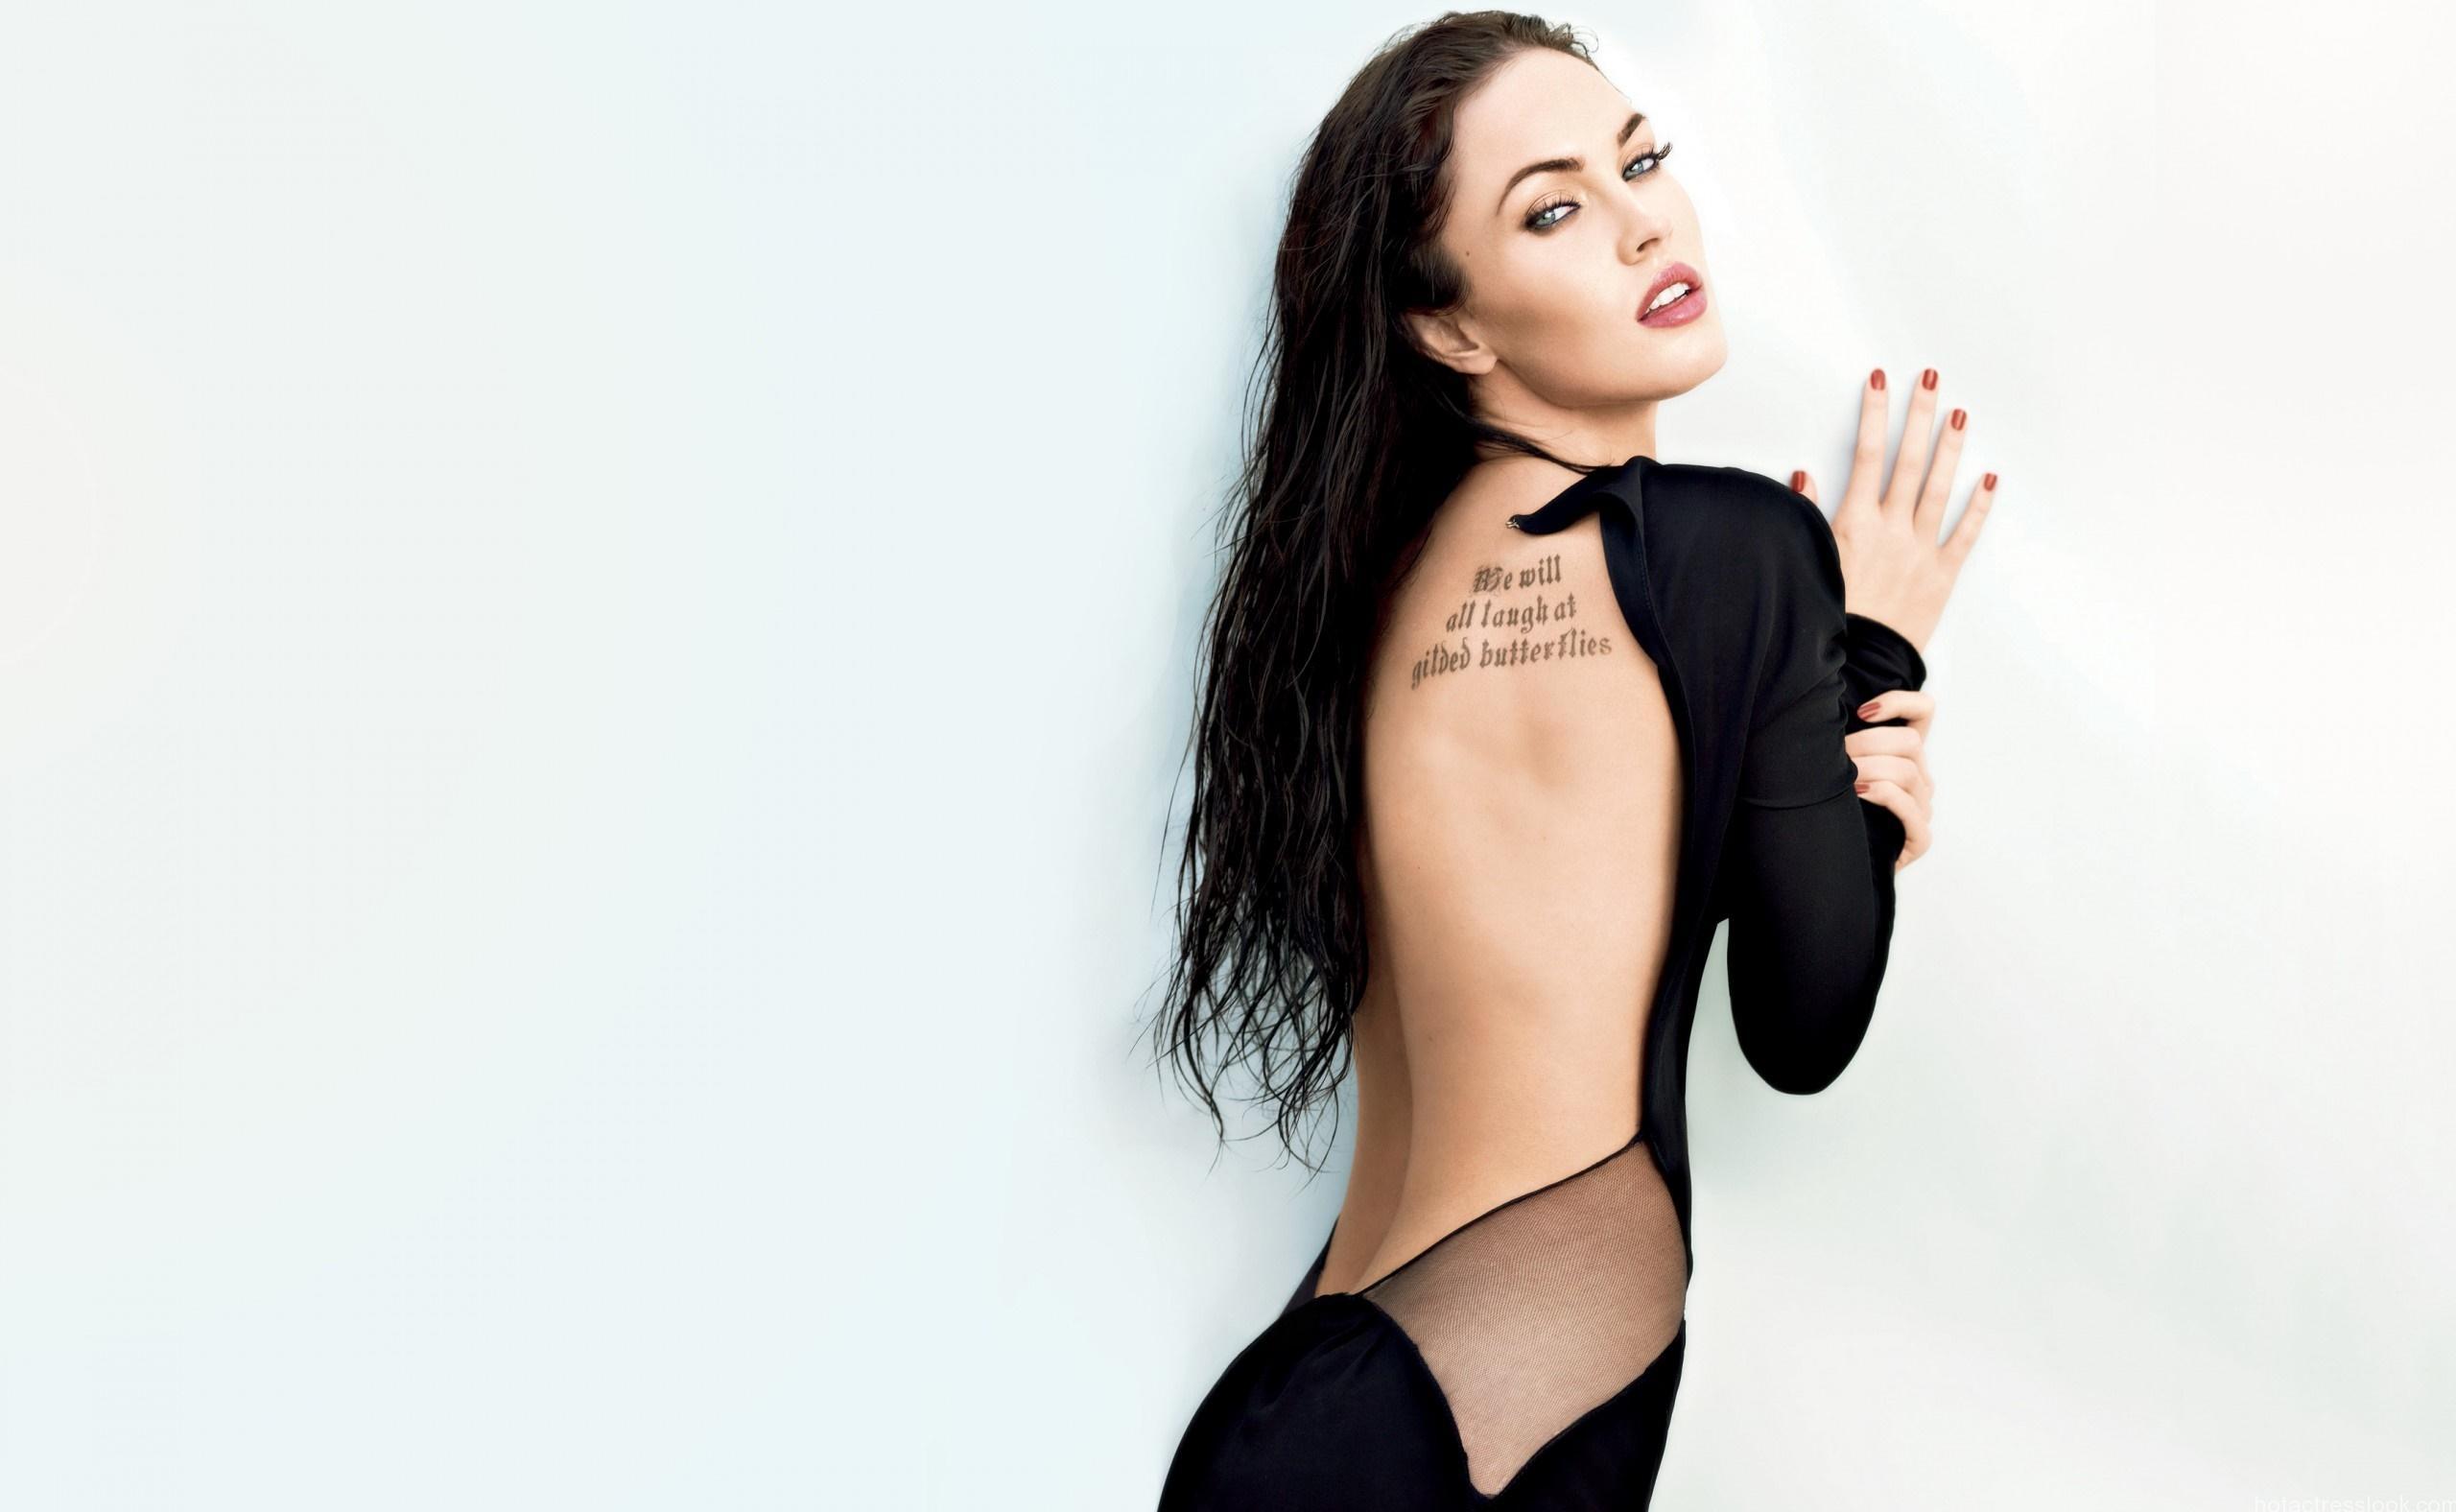 Megan fox sexy hd wallpapers